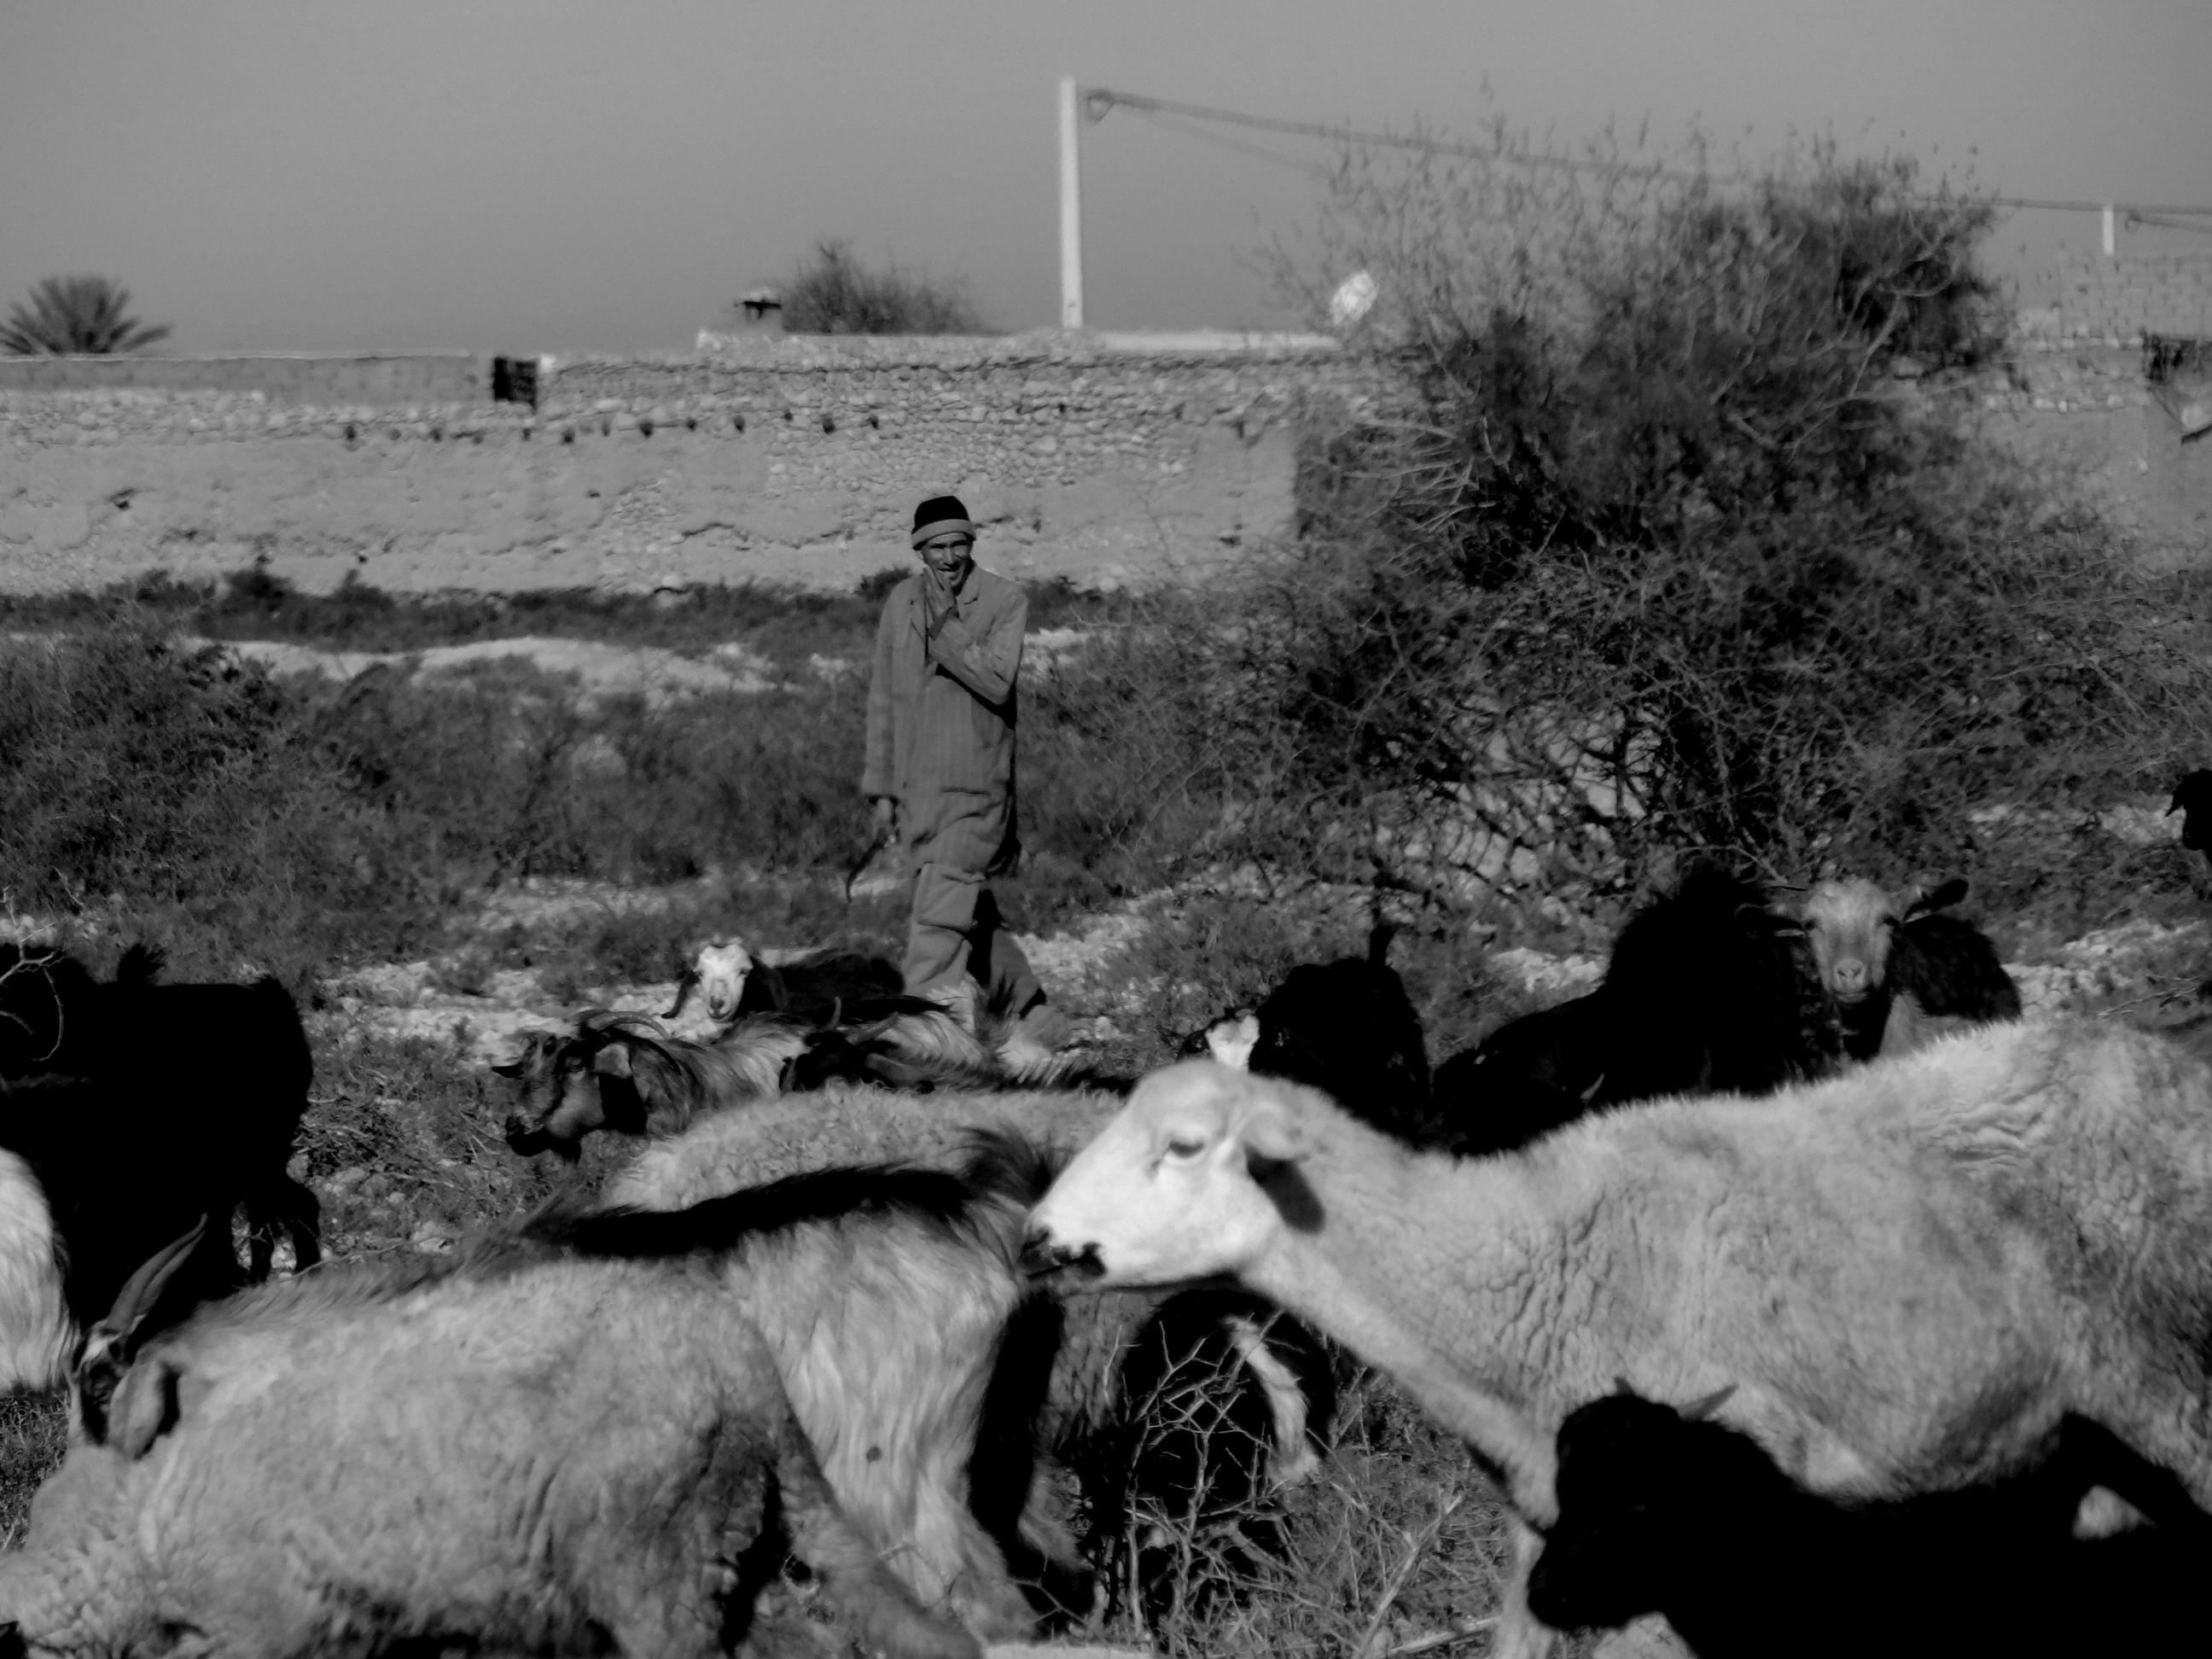 The berber shepherd